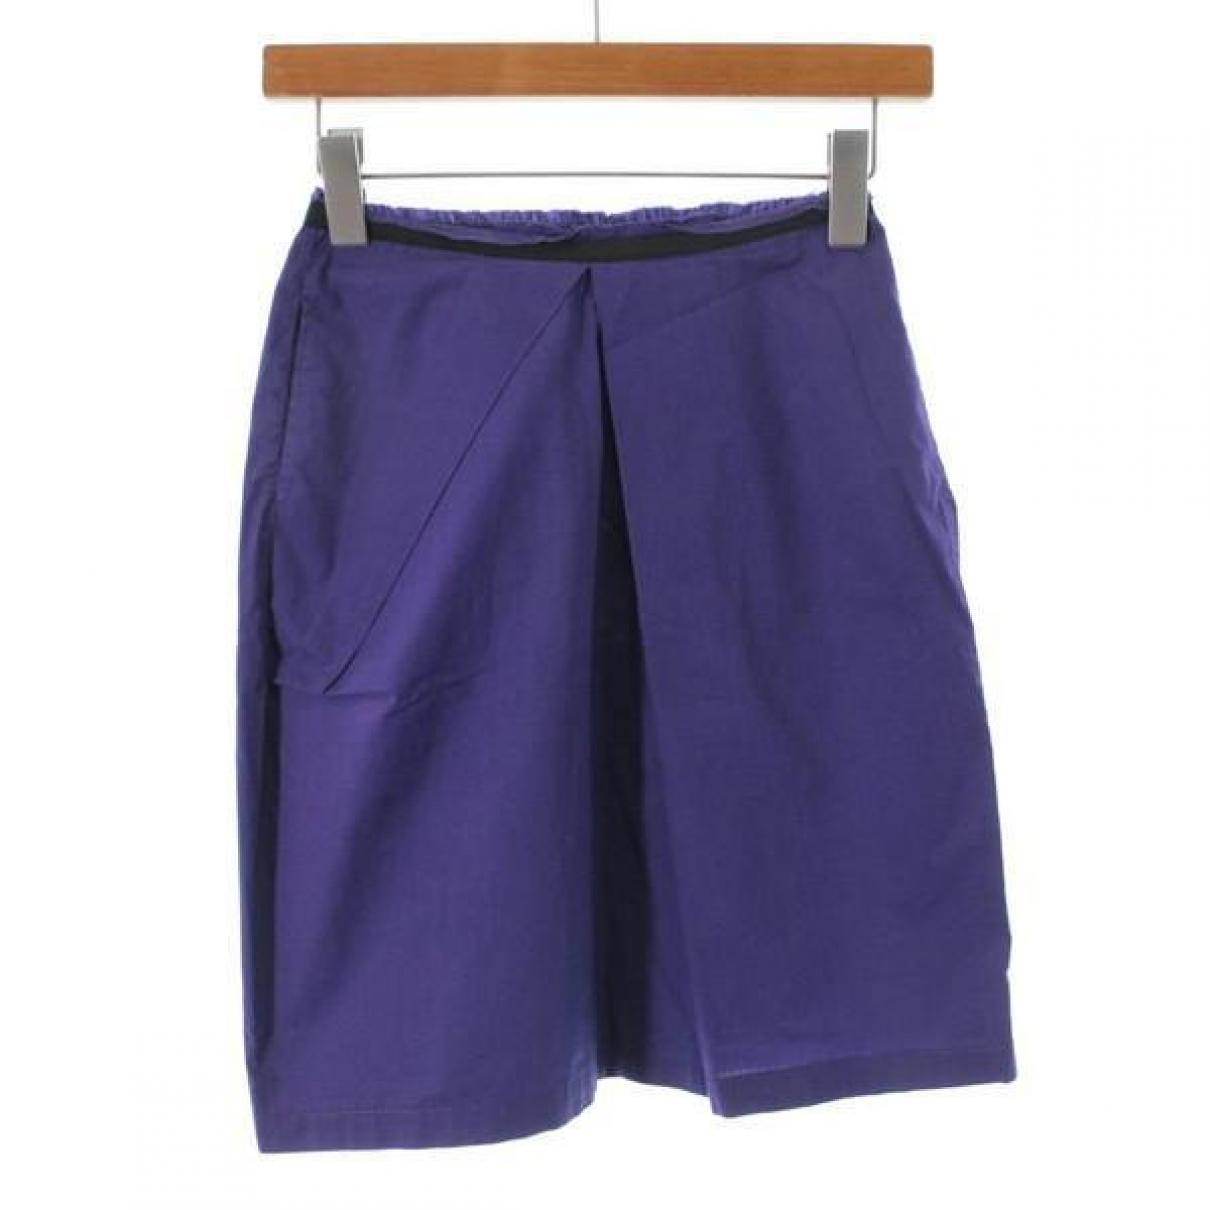 Marni \N Shorts in  Lila Baumwolle